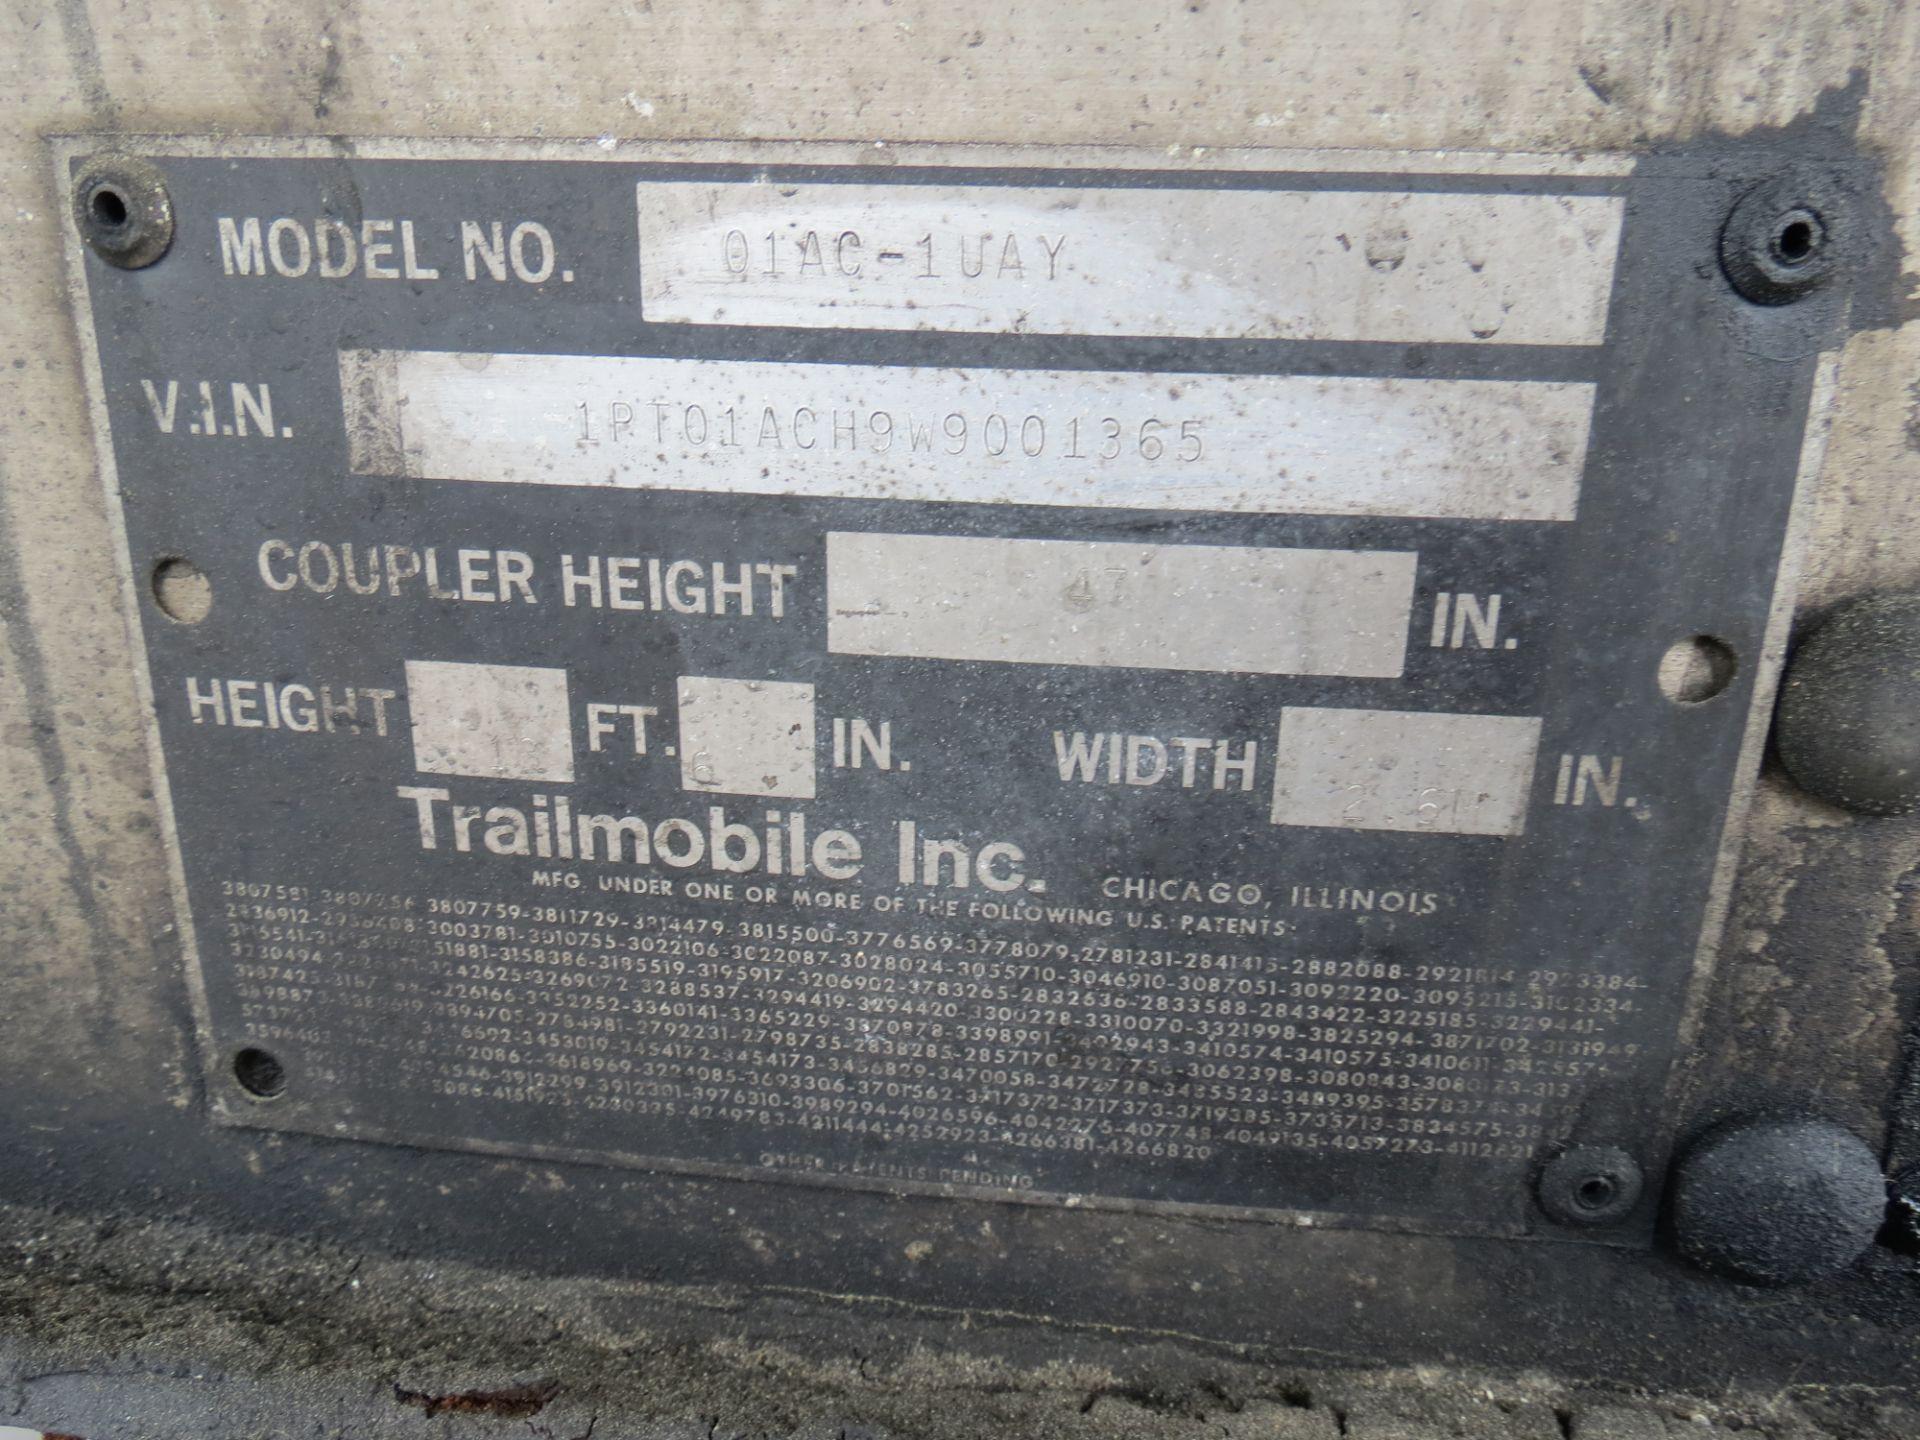 Lot 36 - 1997 Trailmobile 53' Thermo King Smart Reefer #3 Trailer, Model - 01AC-1UAY, VIN: 1